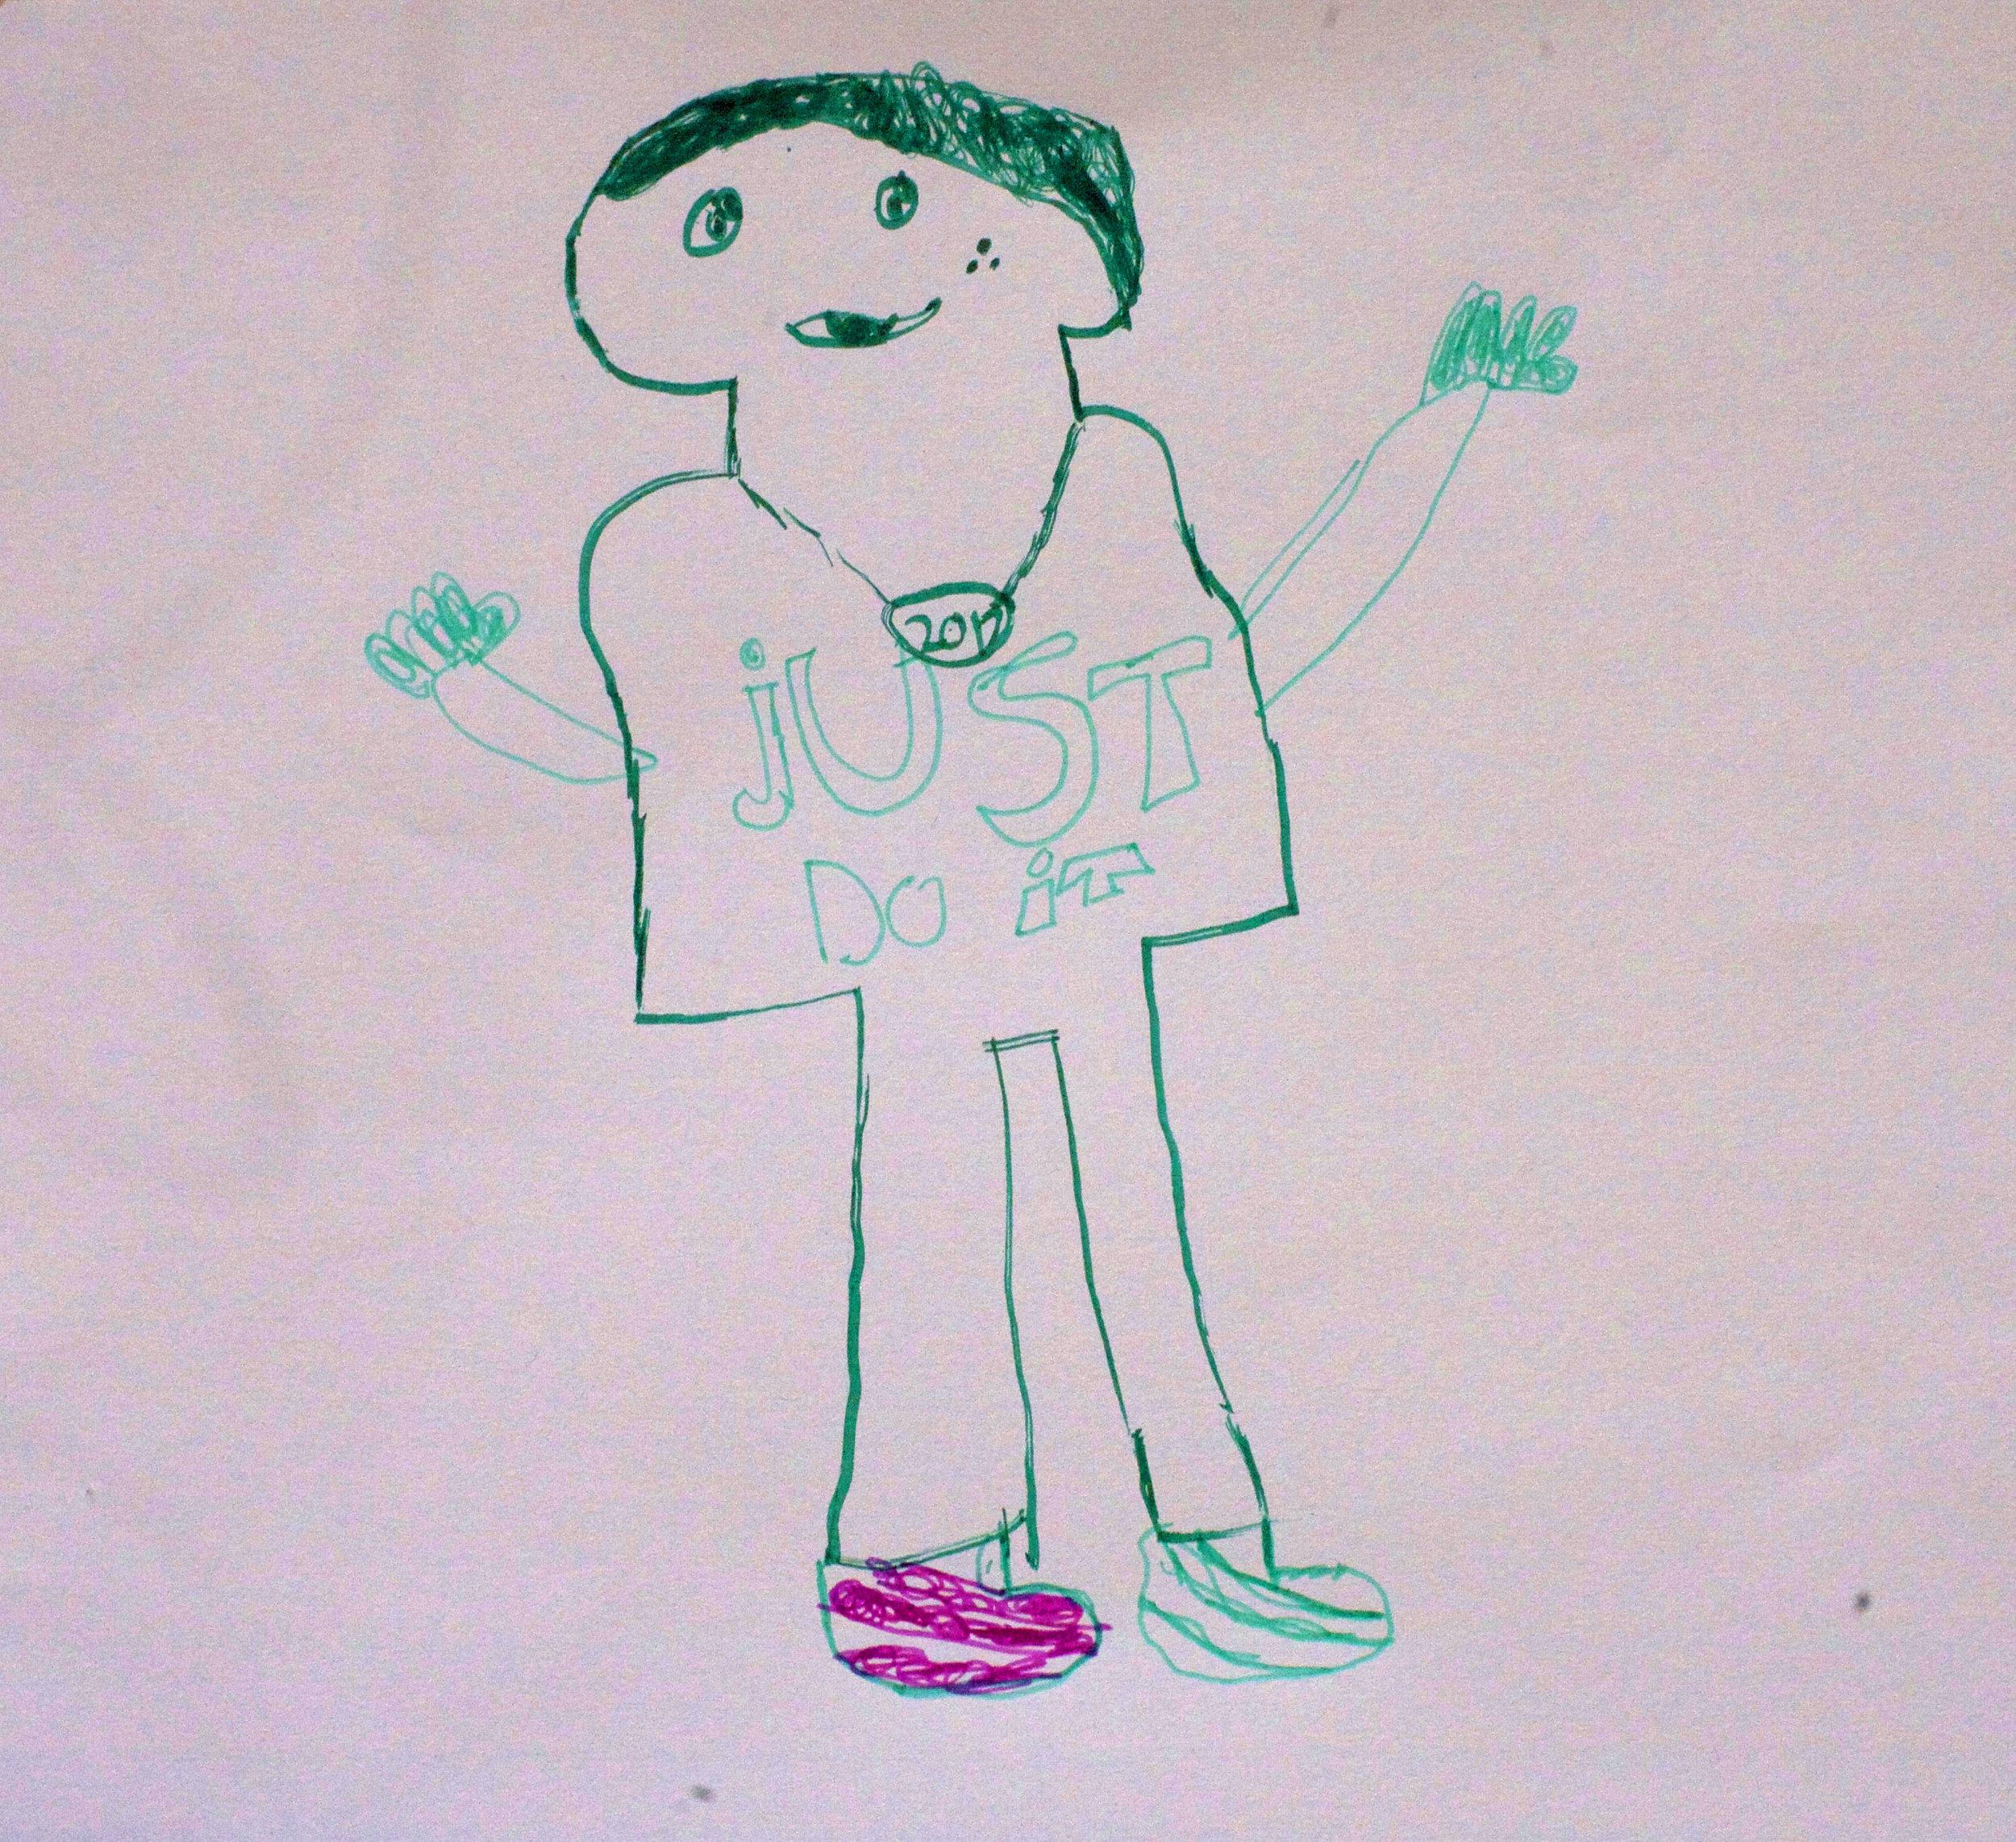 Jillian Lazaridis - Listen to the podcast and see the children's artwork illustrating Jillian's story.